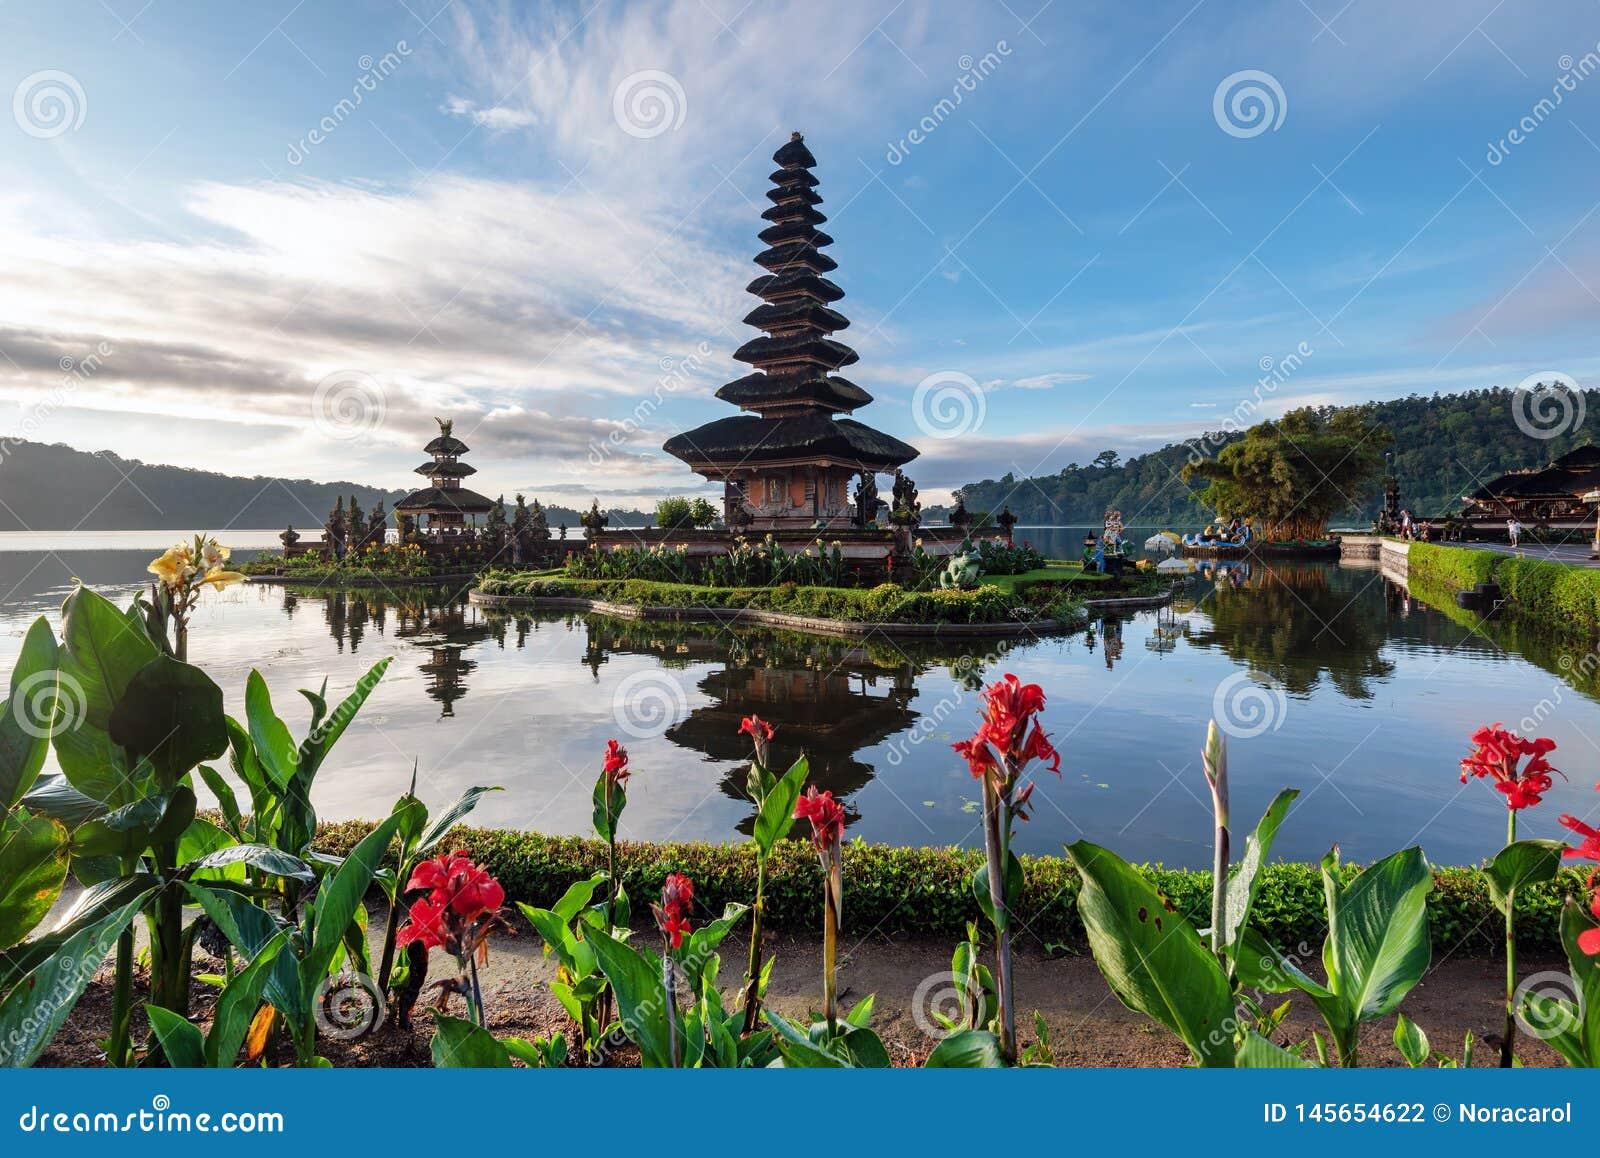 Pura Ulun Danu Bratan In Bedugul Bali Stock Photo Image Of